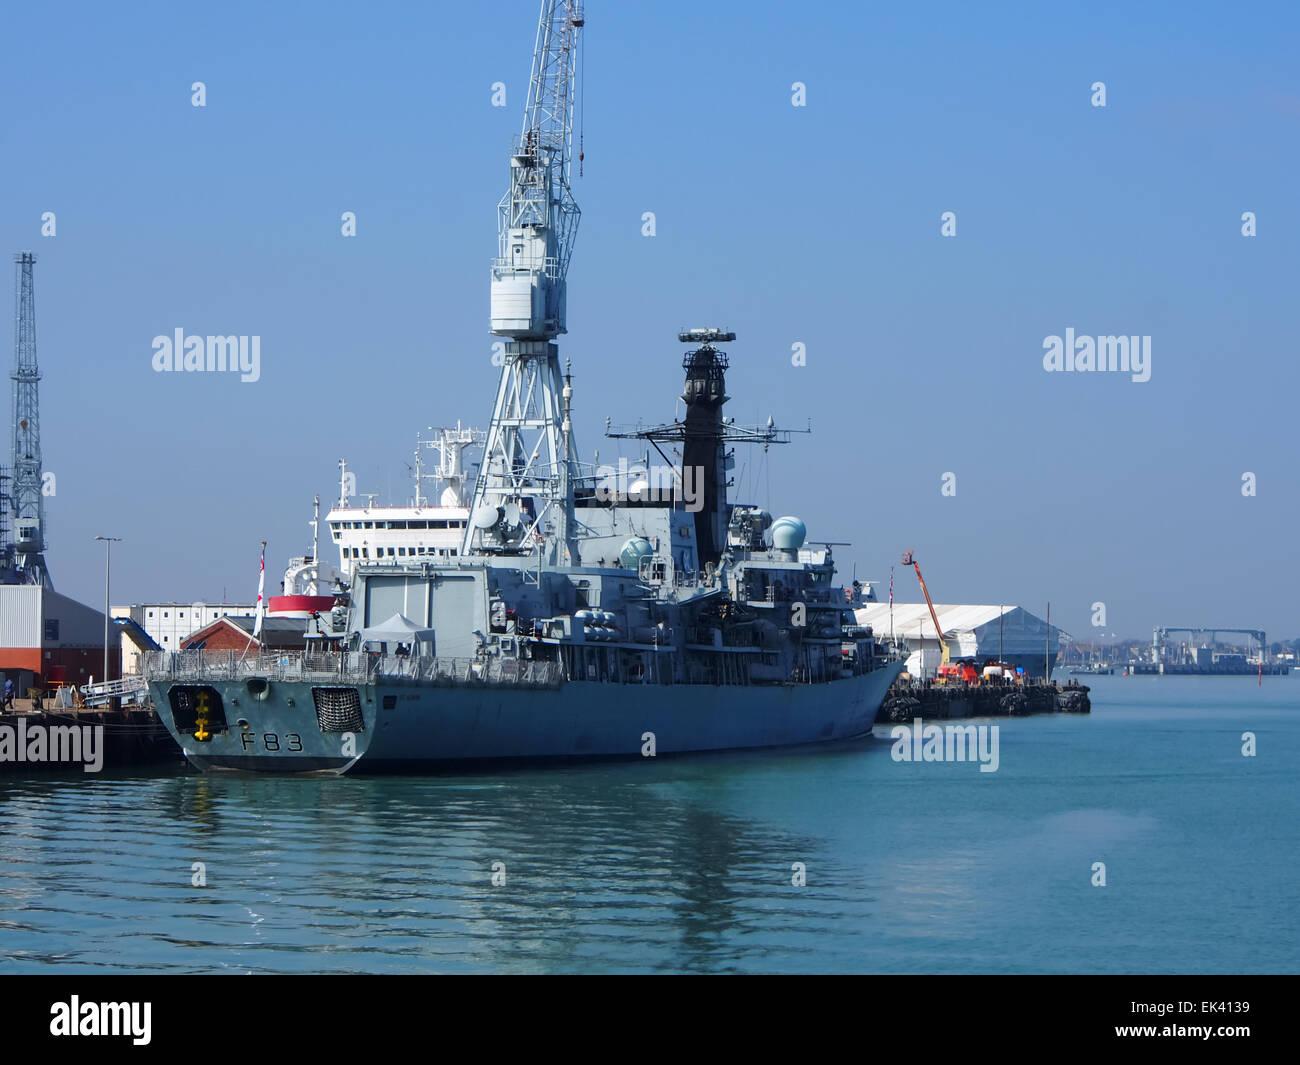 Duke class frigate HMS St Albans F83 undergoing maintenance in HM dockyard Portsmouth - Stock Image